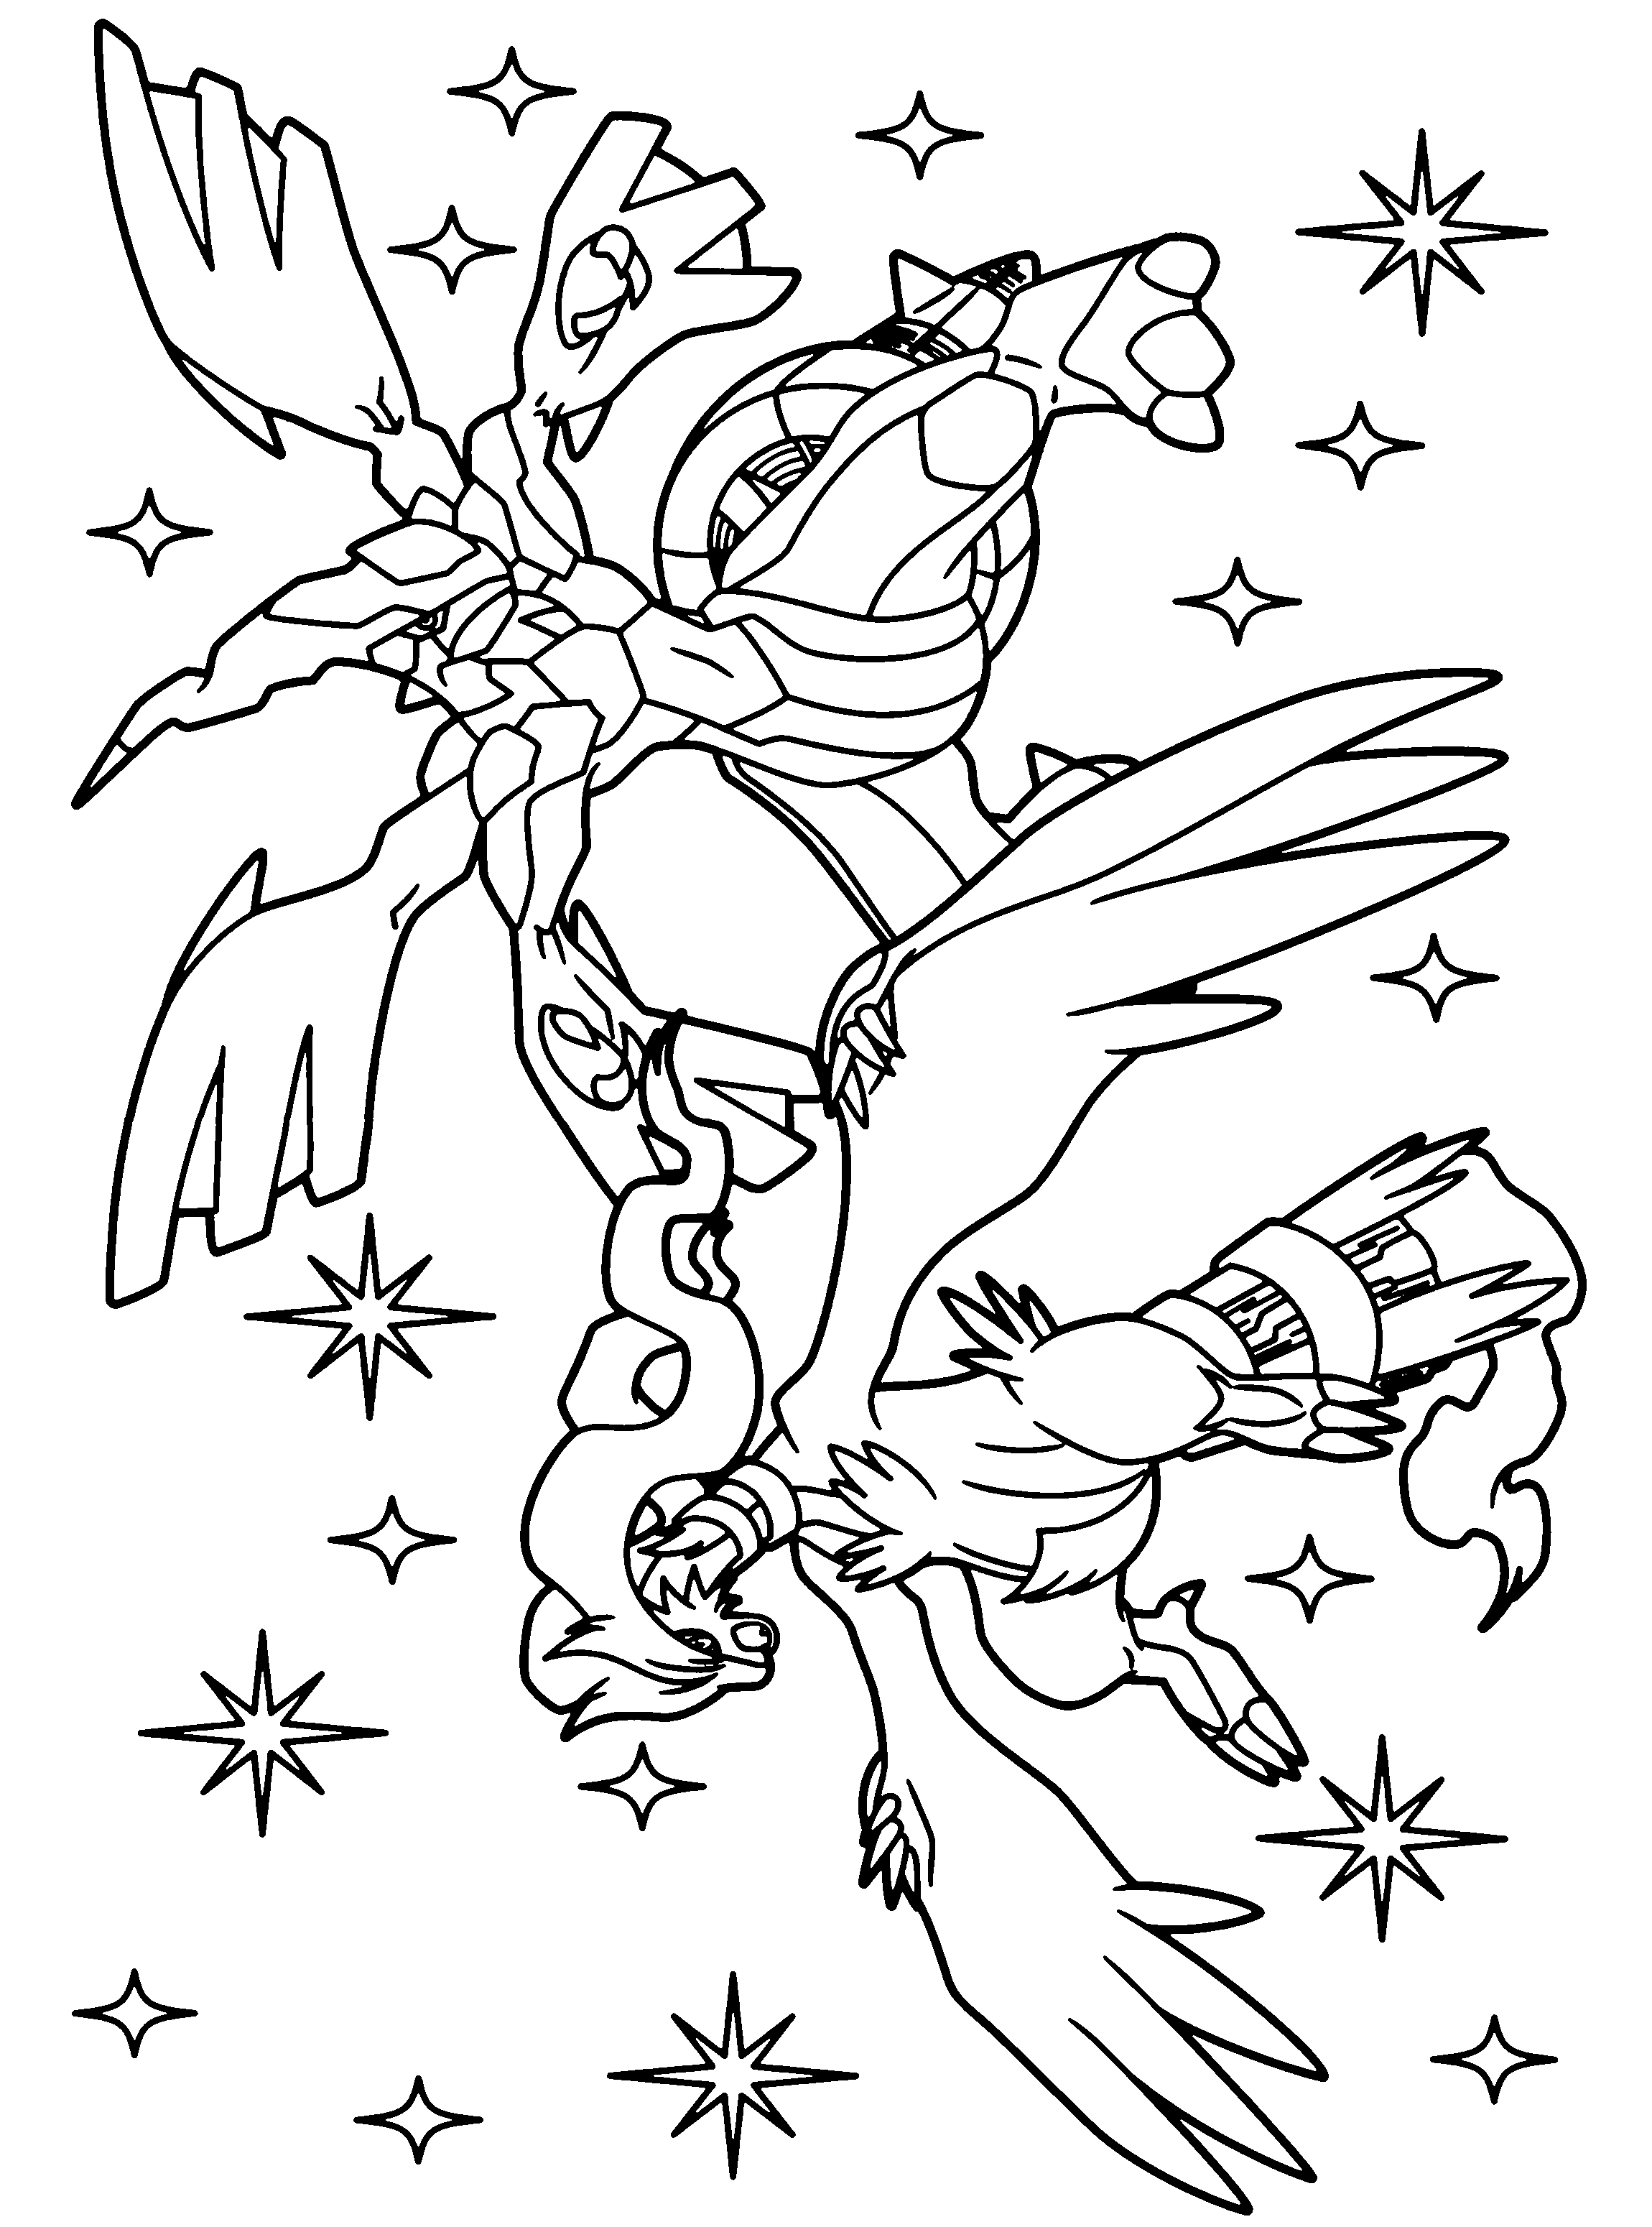 Coloriage Pokemon Zekrom Et Reshiram À Imprimer dedans Imprimer Coloriage Pokemon